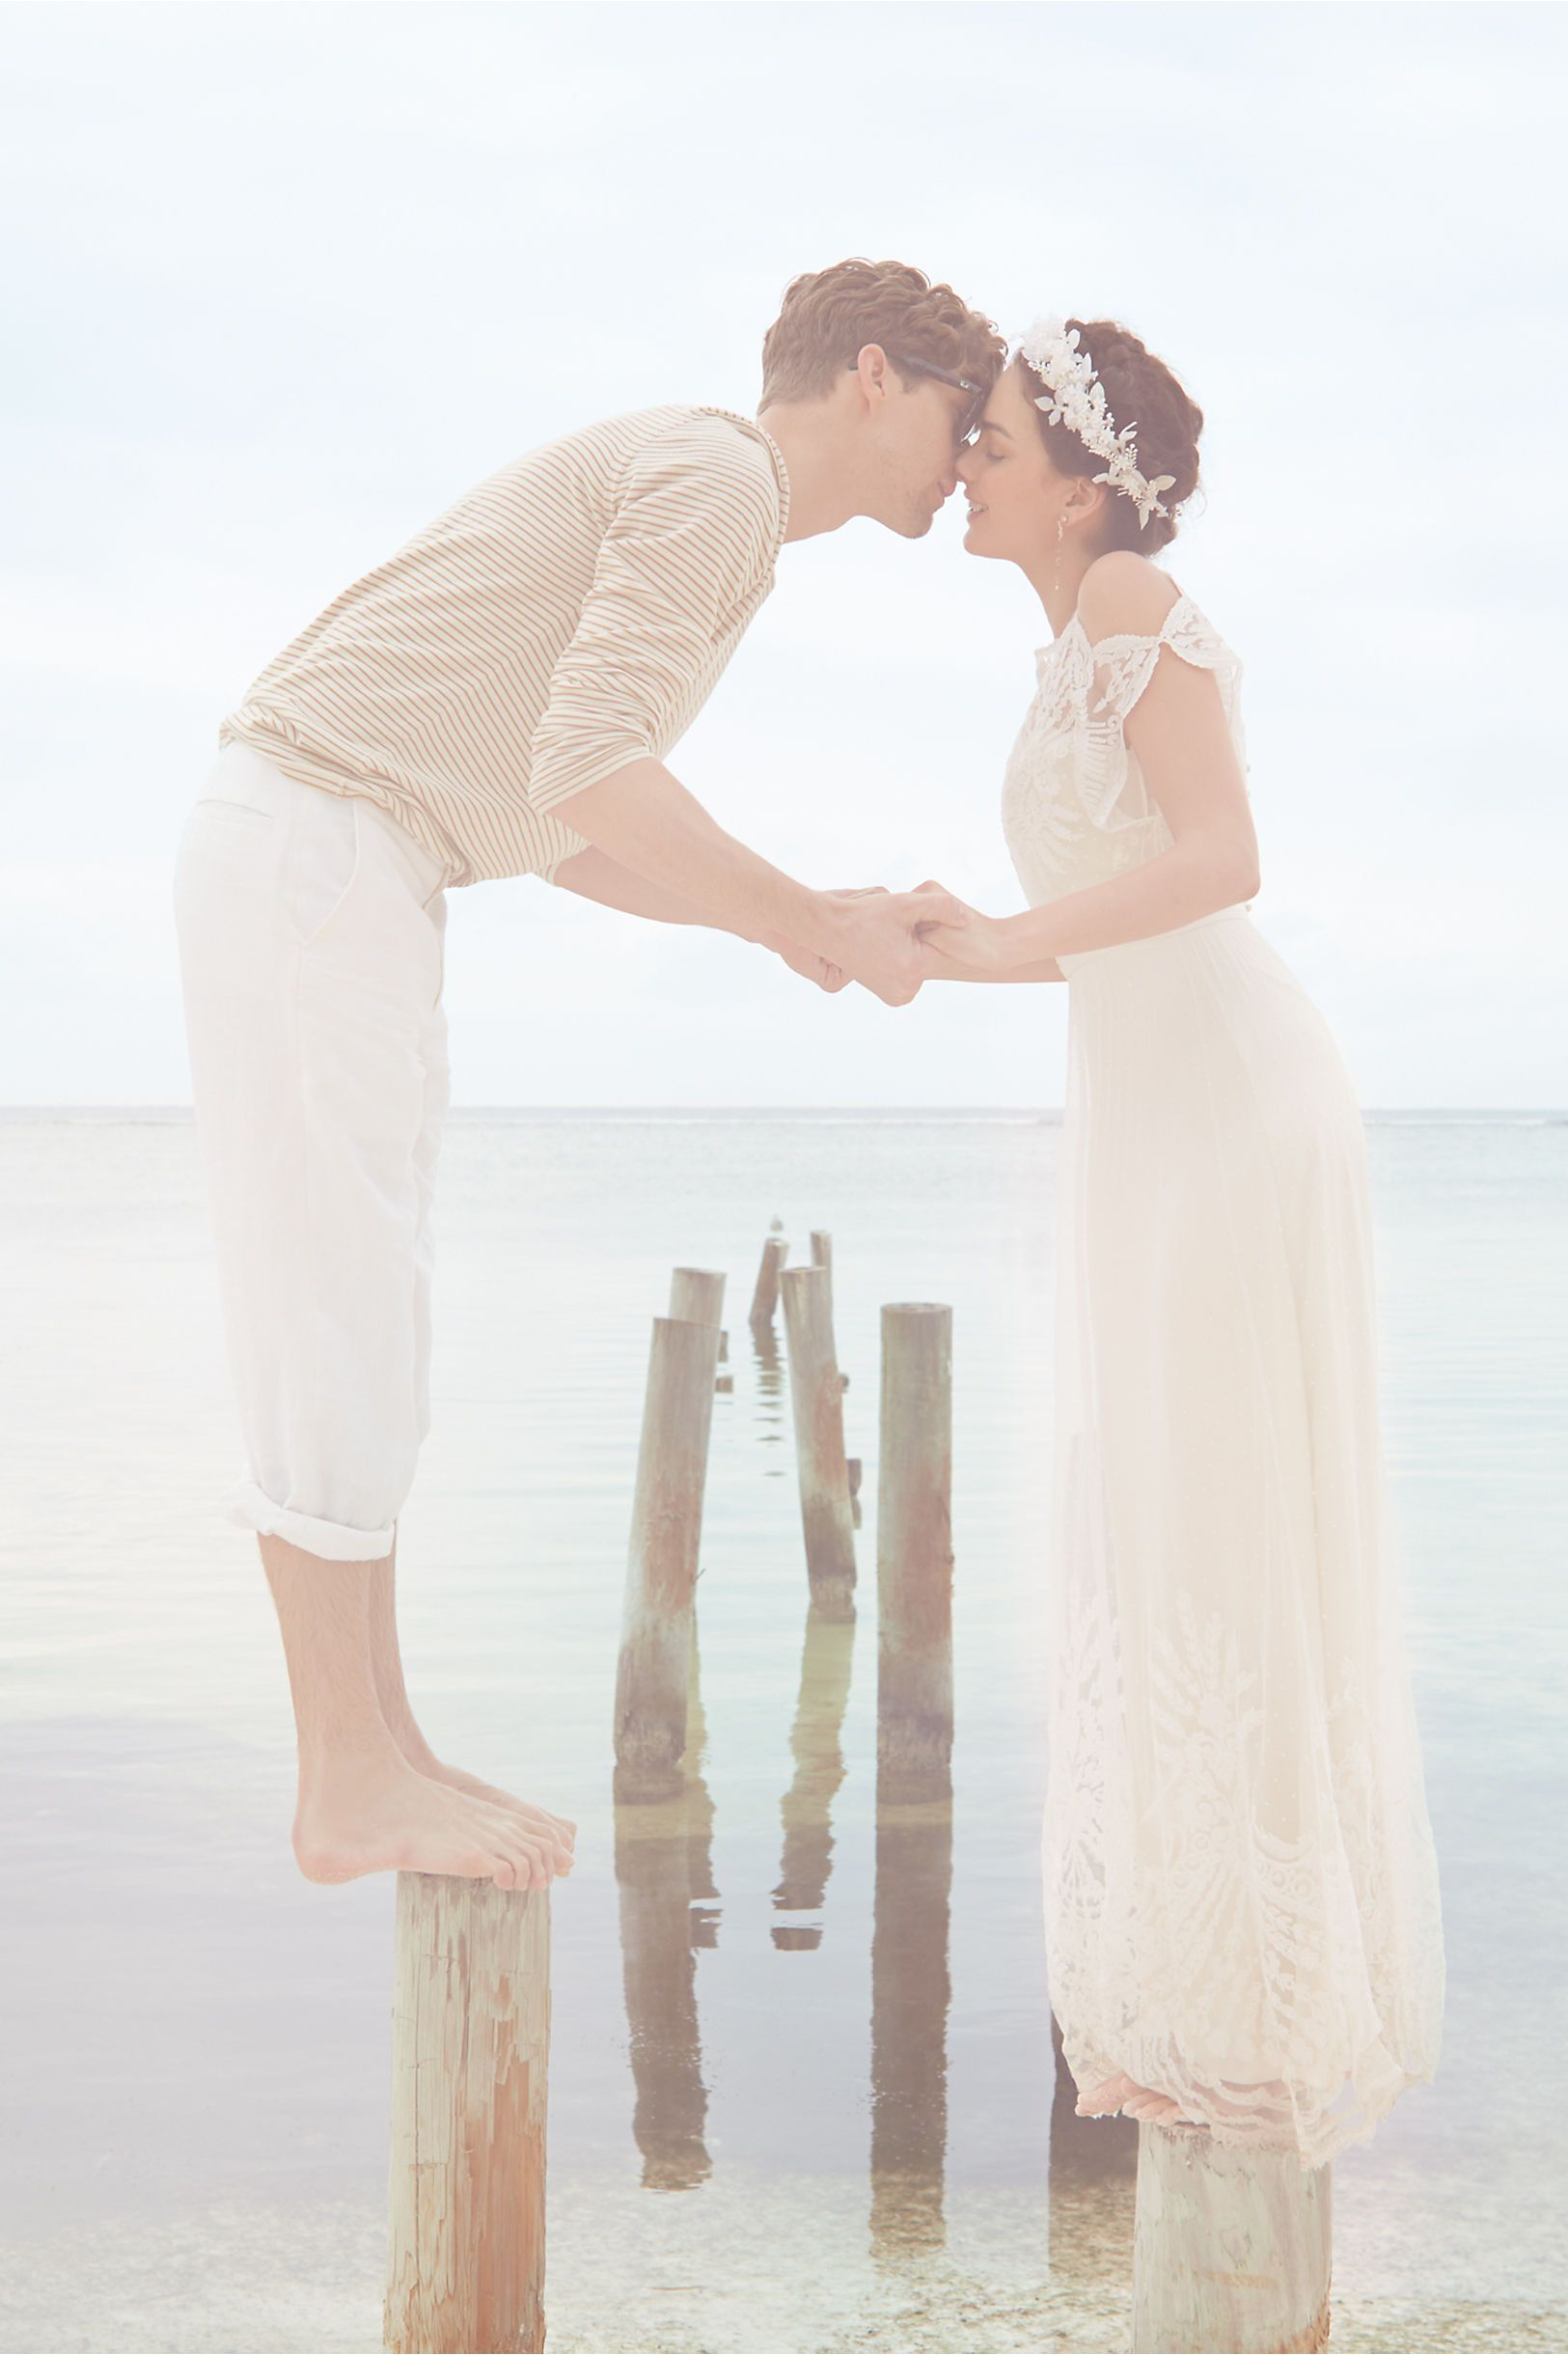 Beijo noivos aquelemomentoextra pinterest gowns wedding